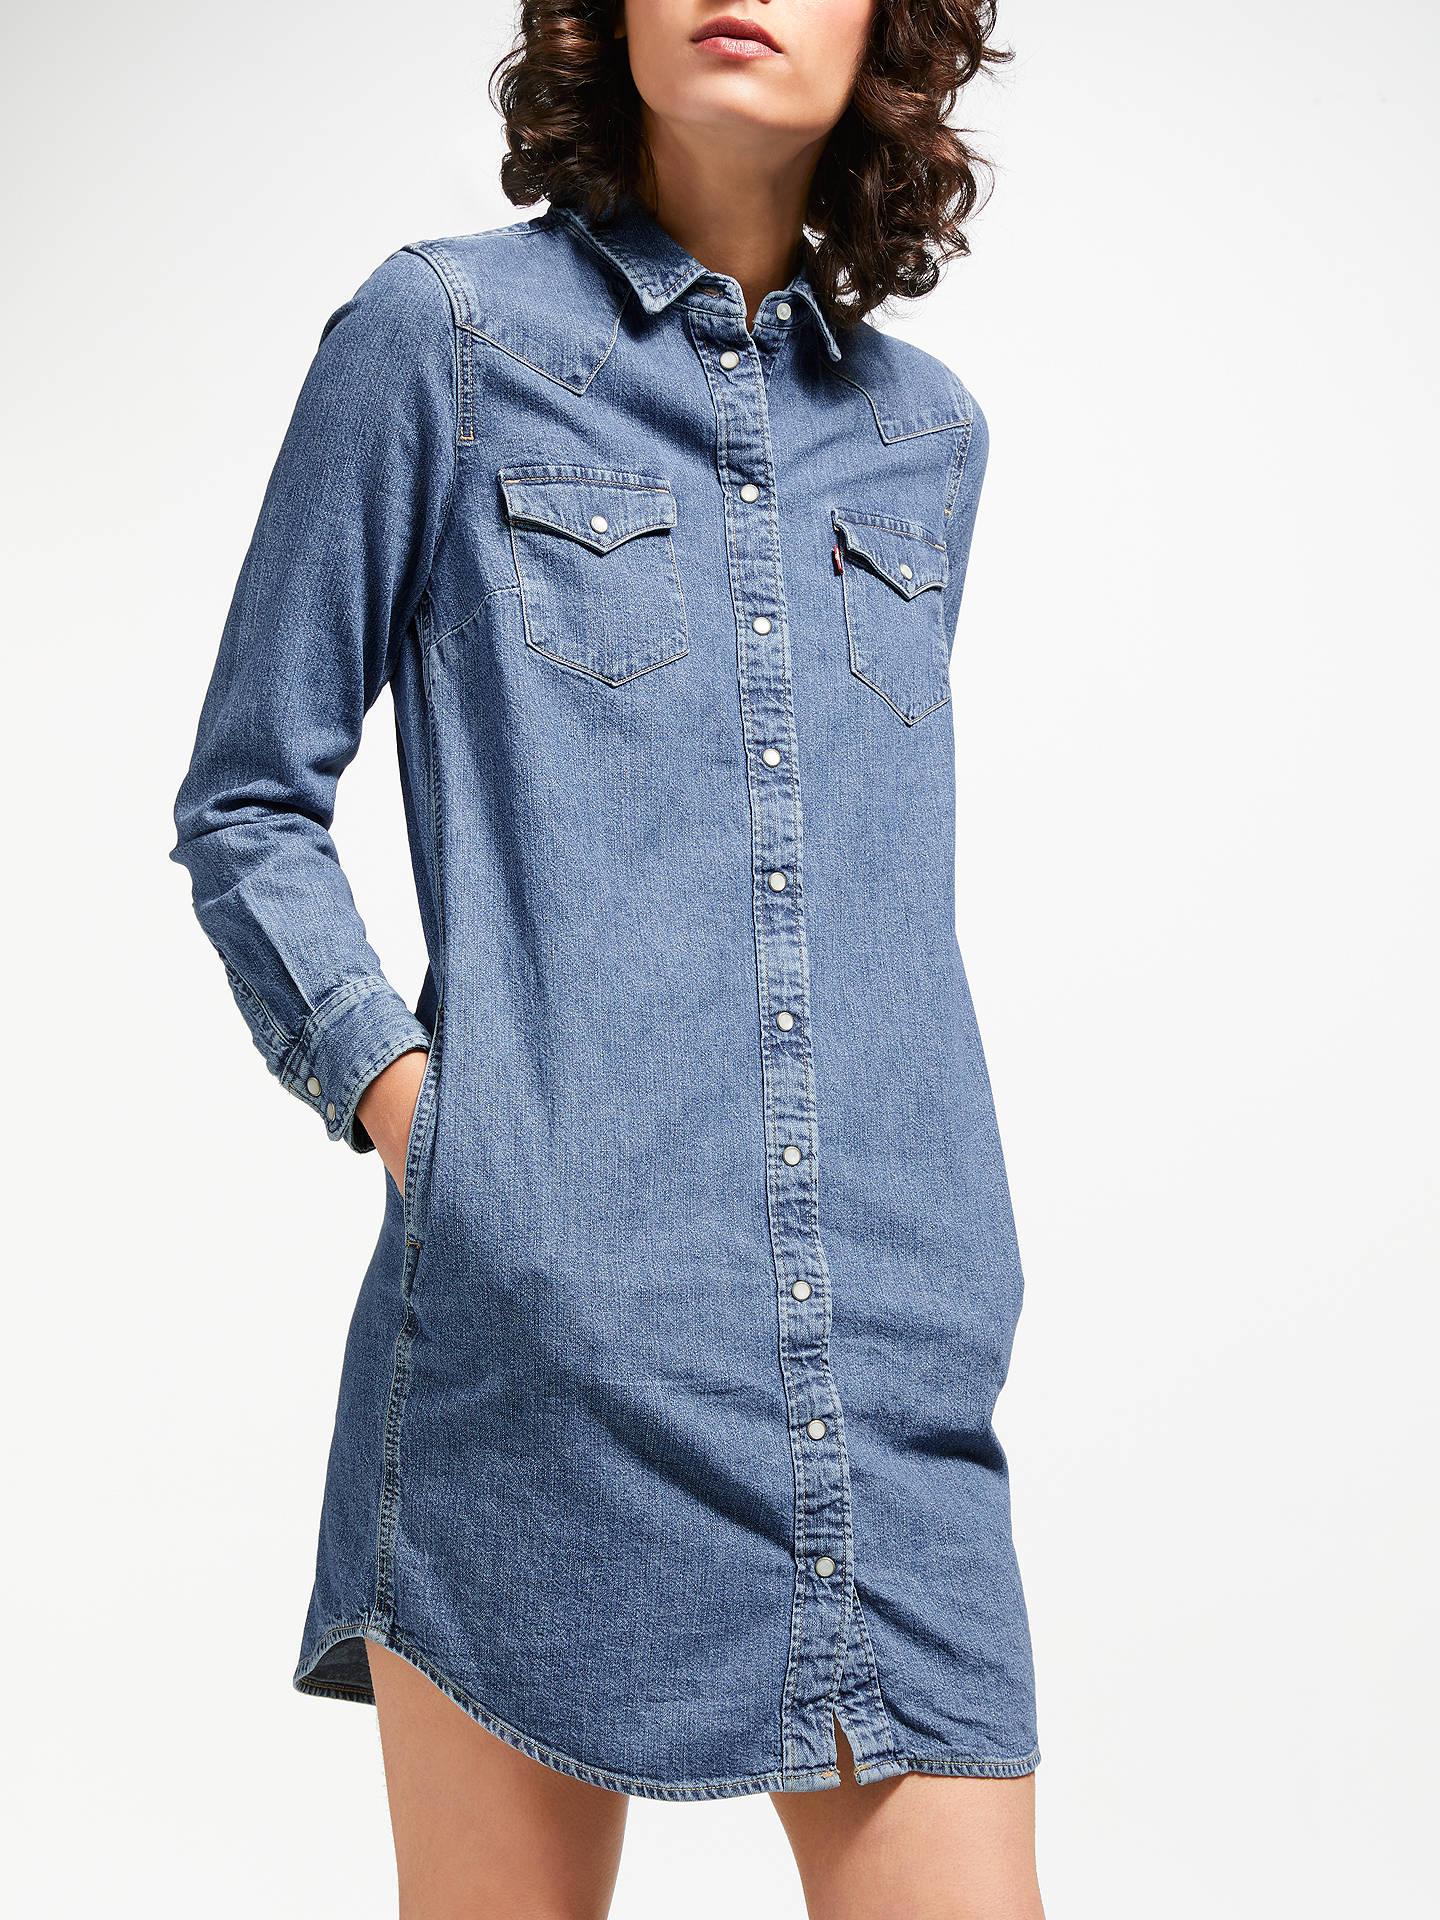 Levi's Womens Iconic Western Long Sleeve Dress @ Amazon for £42.50